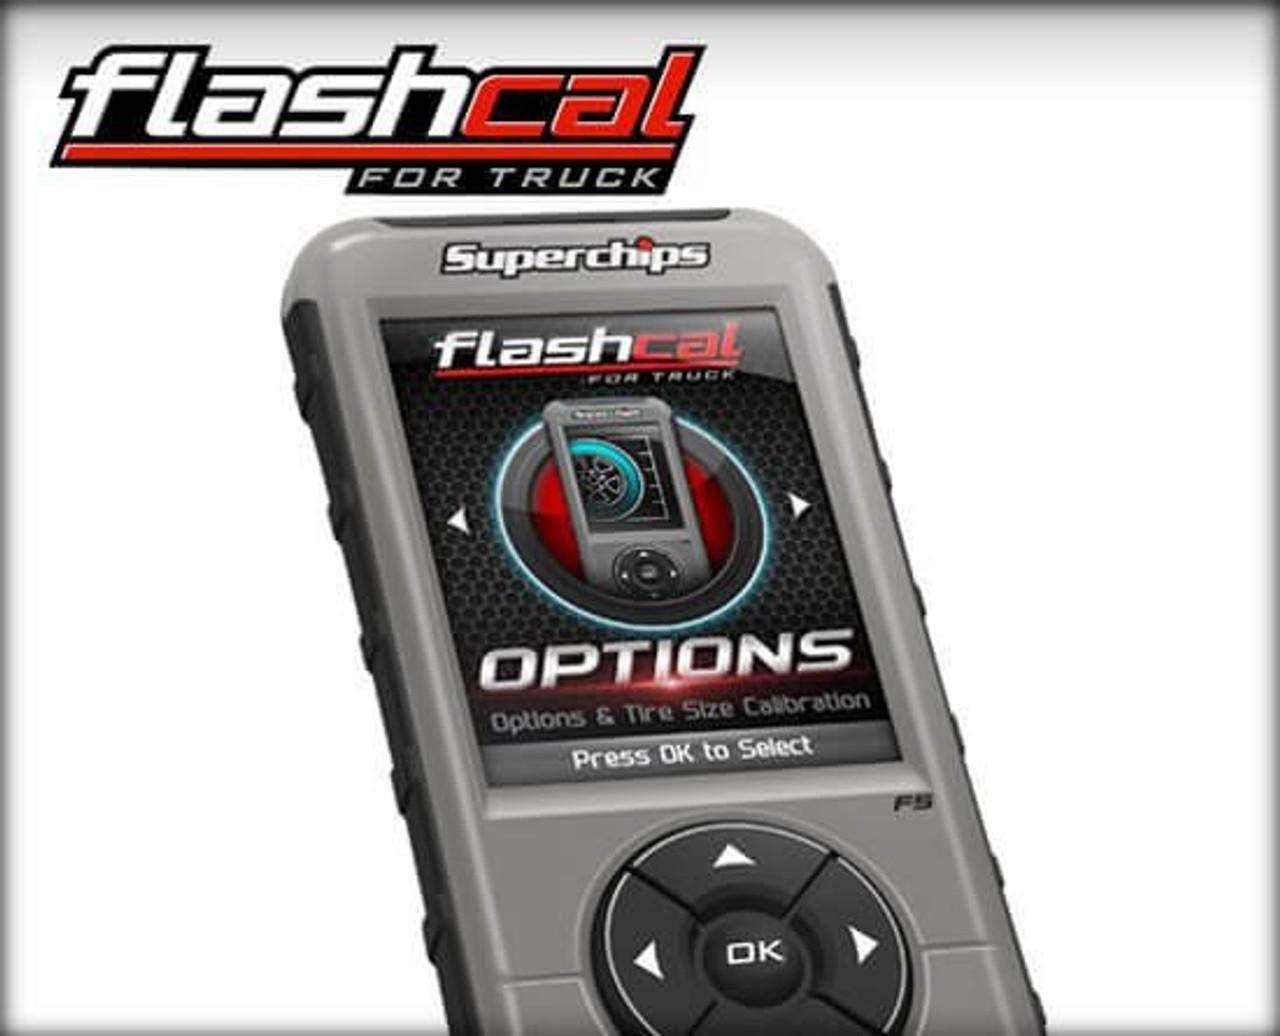 3545 Superchips Flashcal 1998-2016 Dodge/RAM Trucks